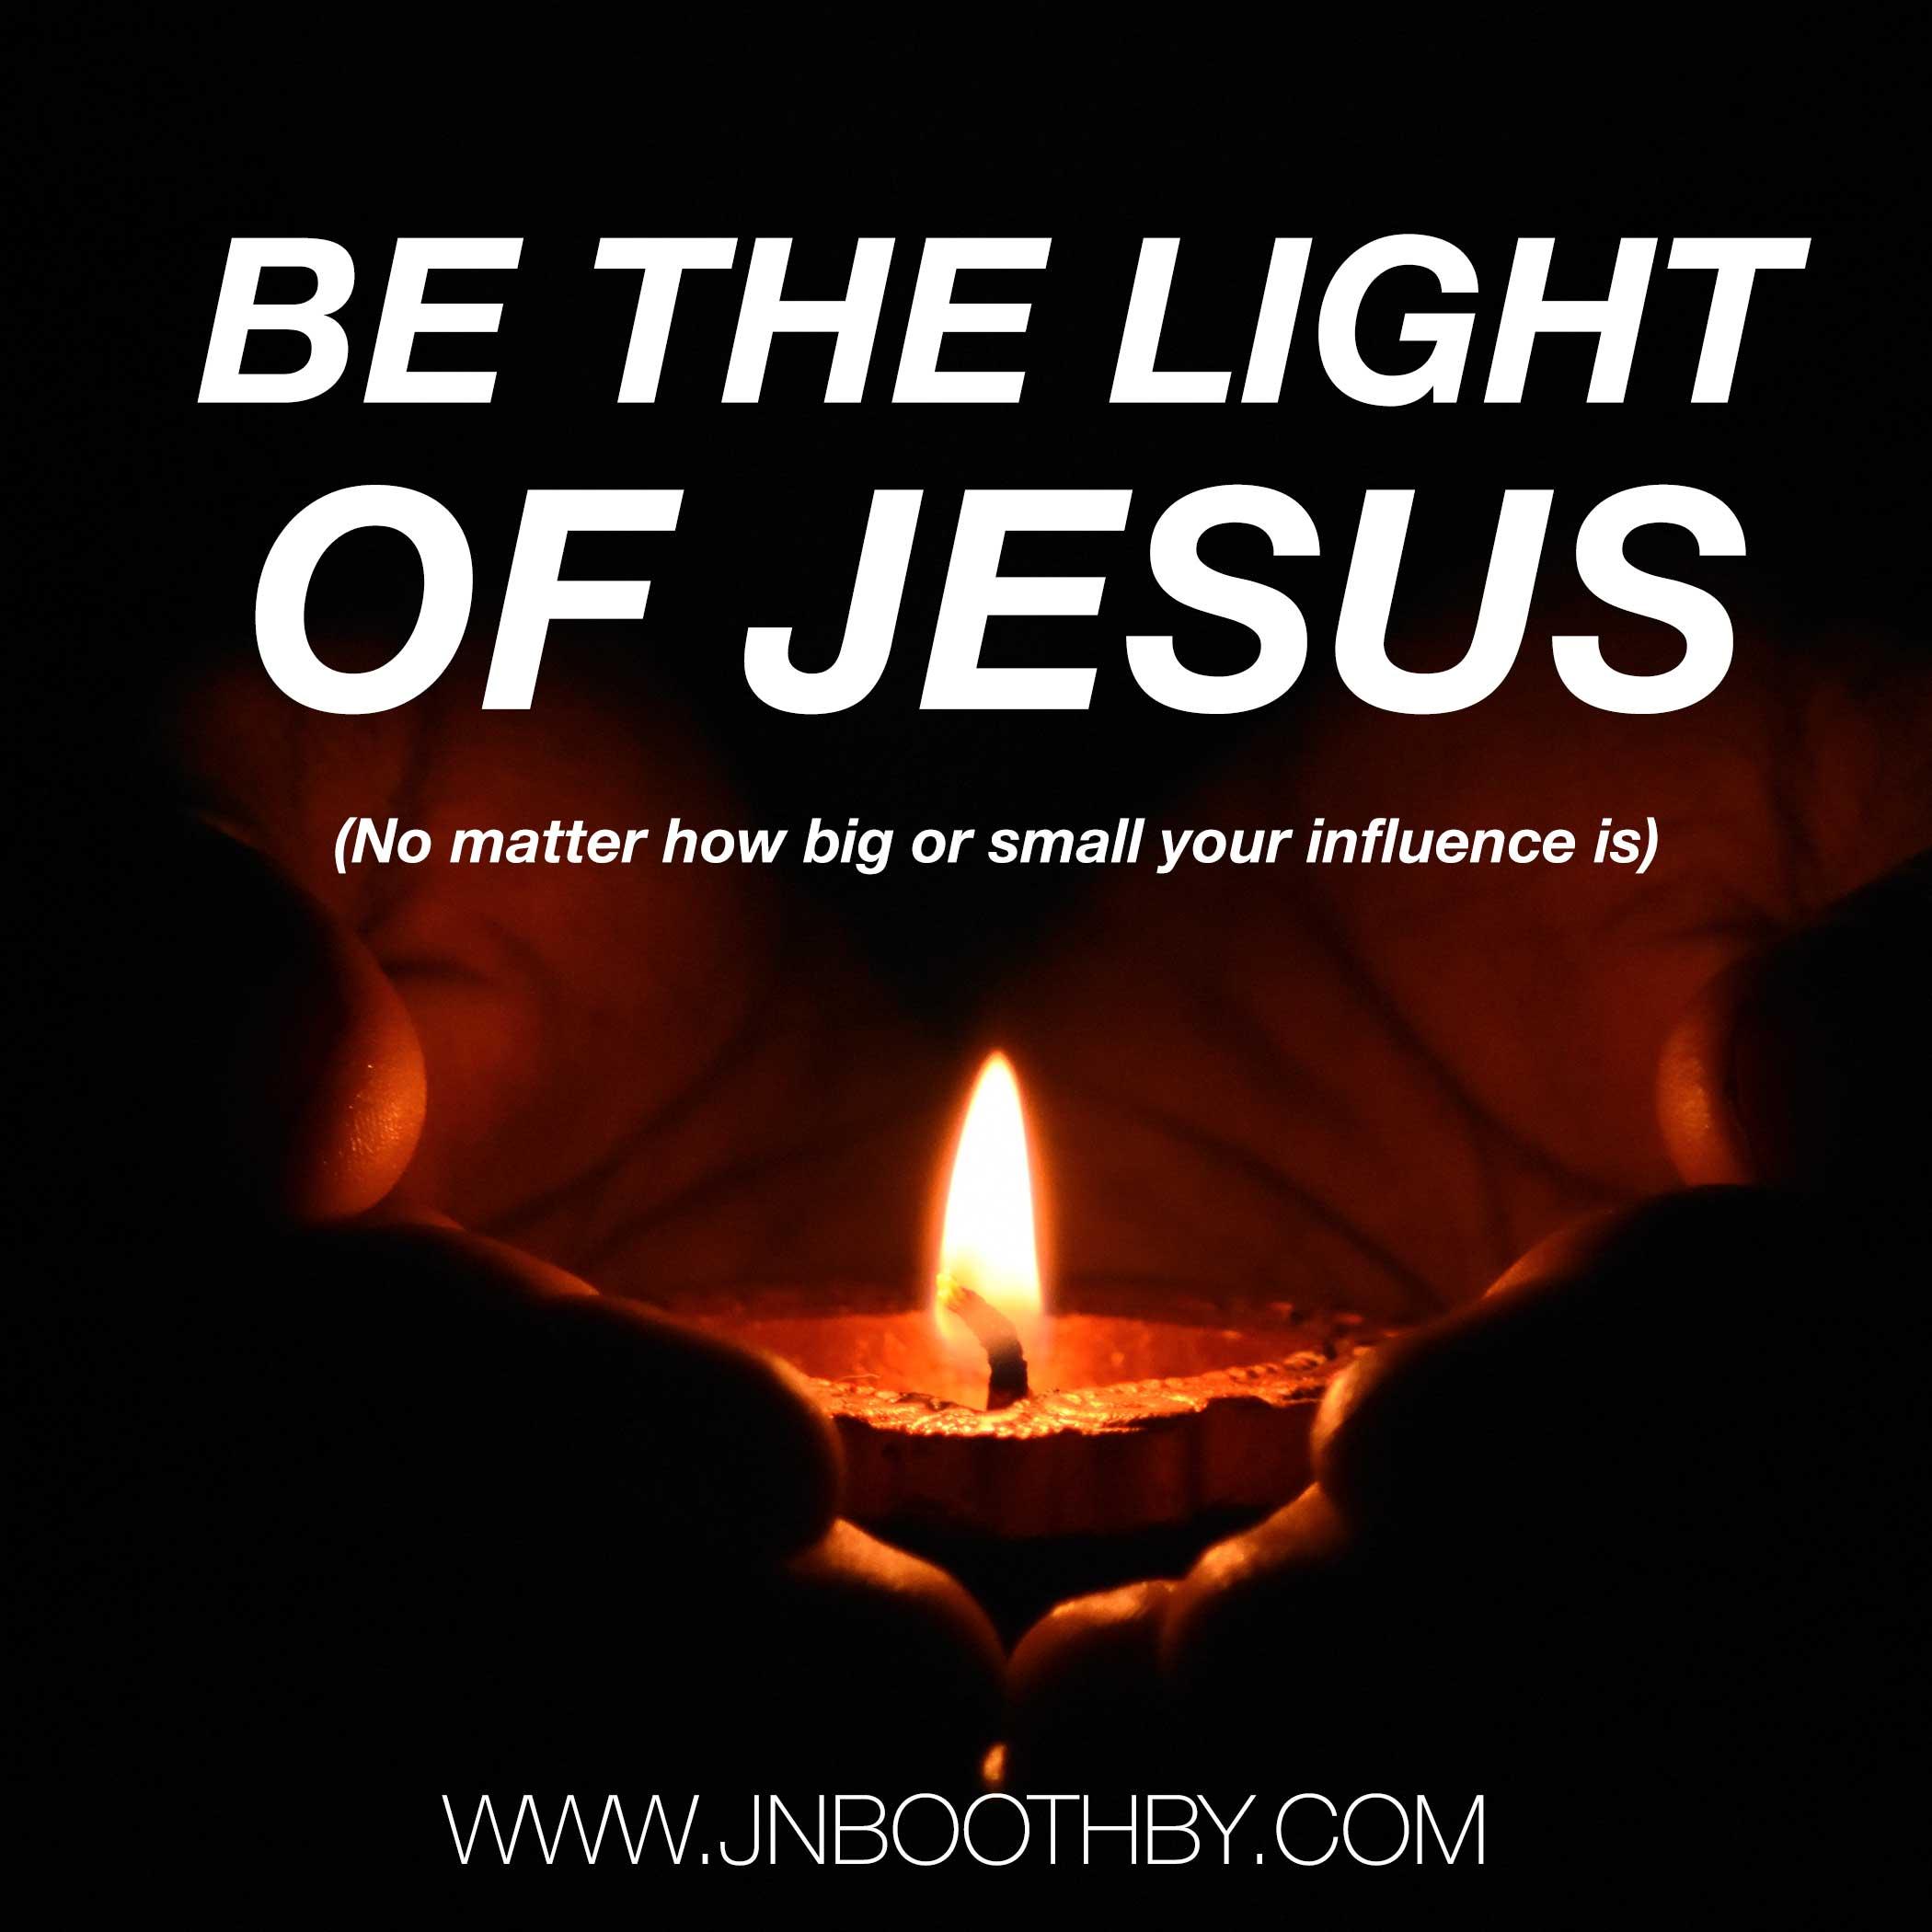 be the light of jesus